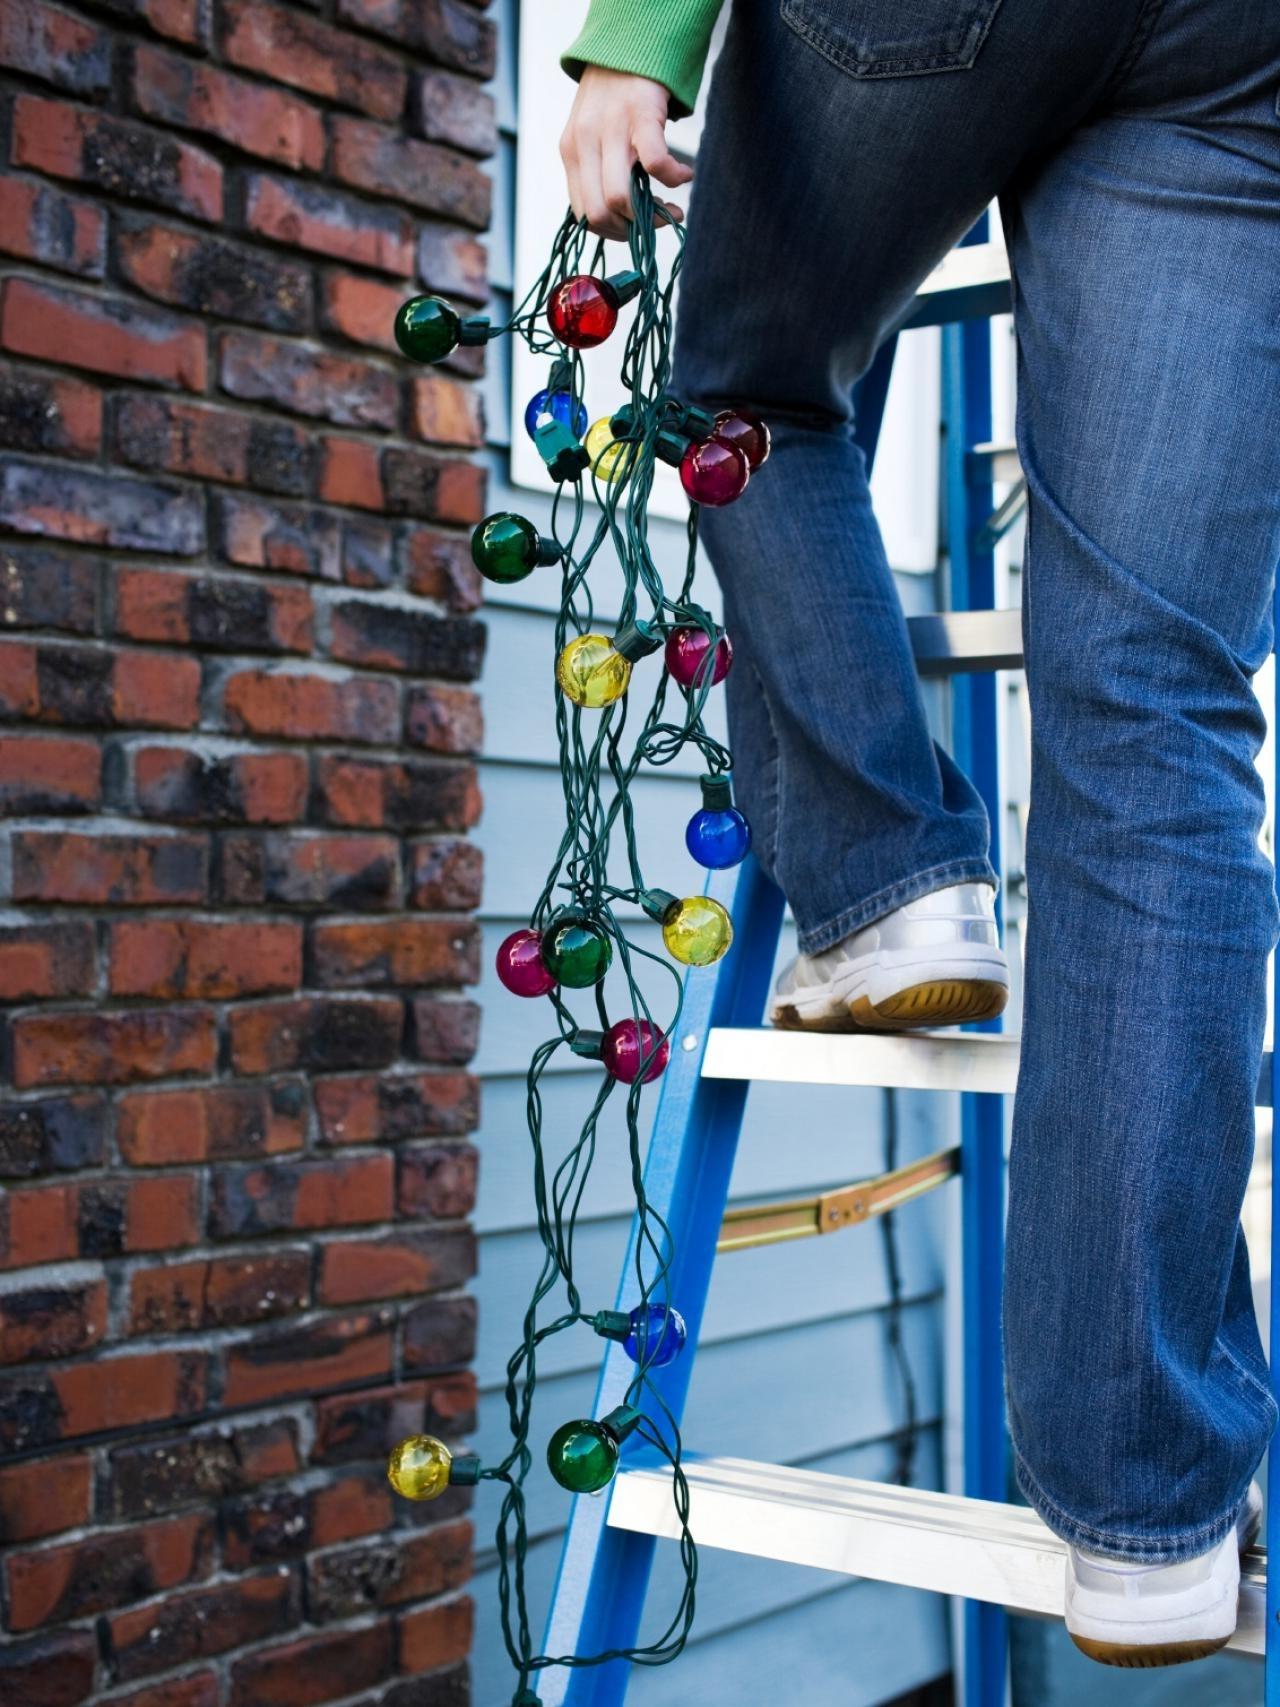 How To Hang Christmas Lights (Gallery 7 of 20)